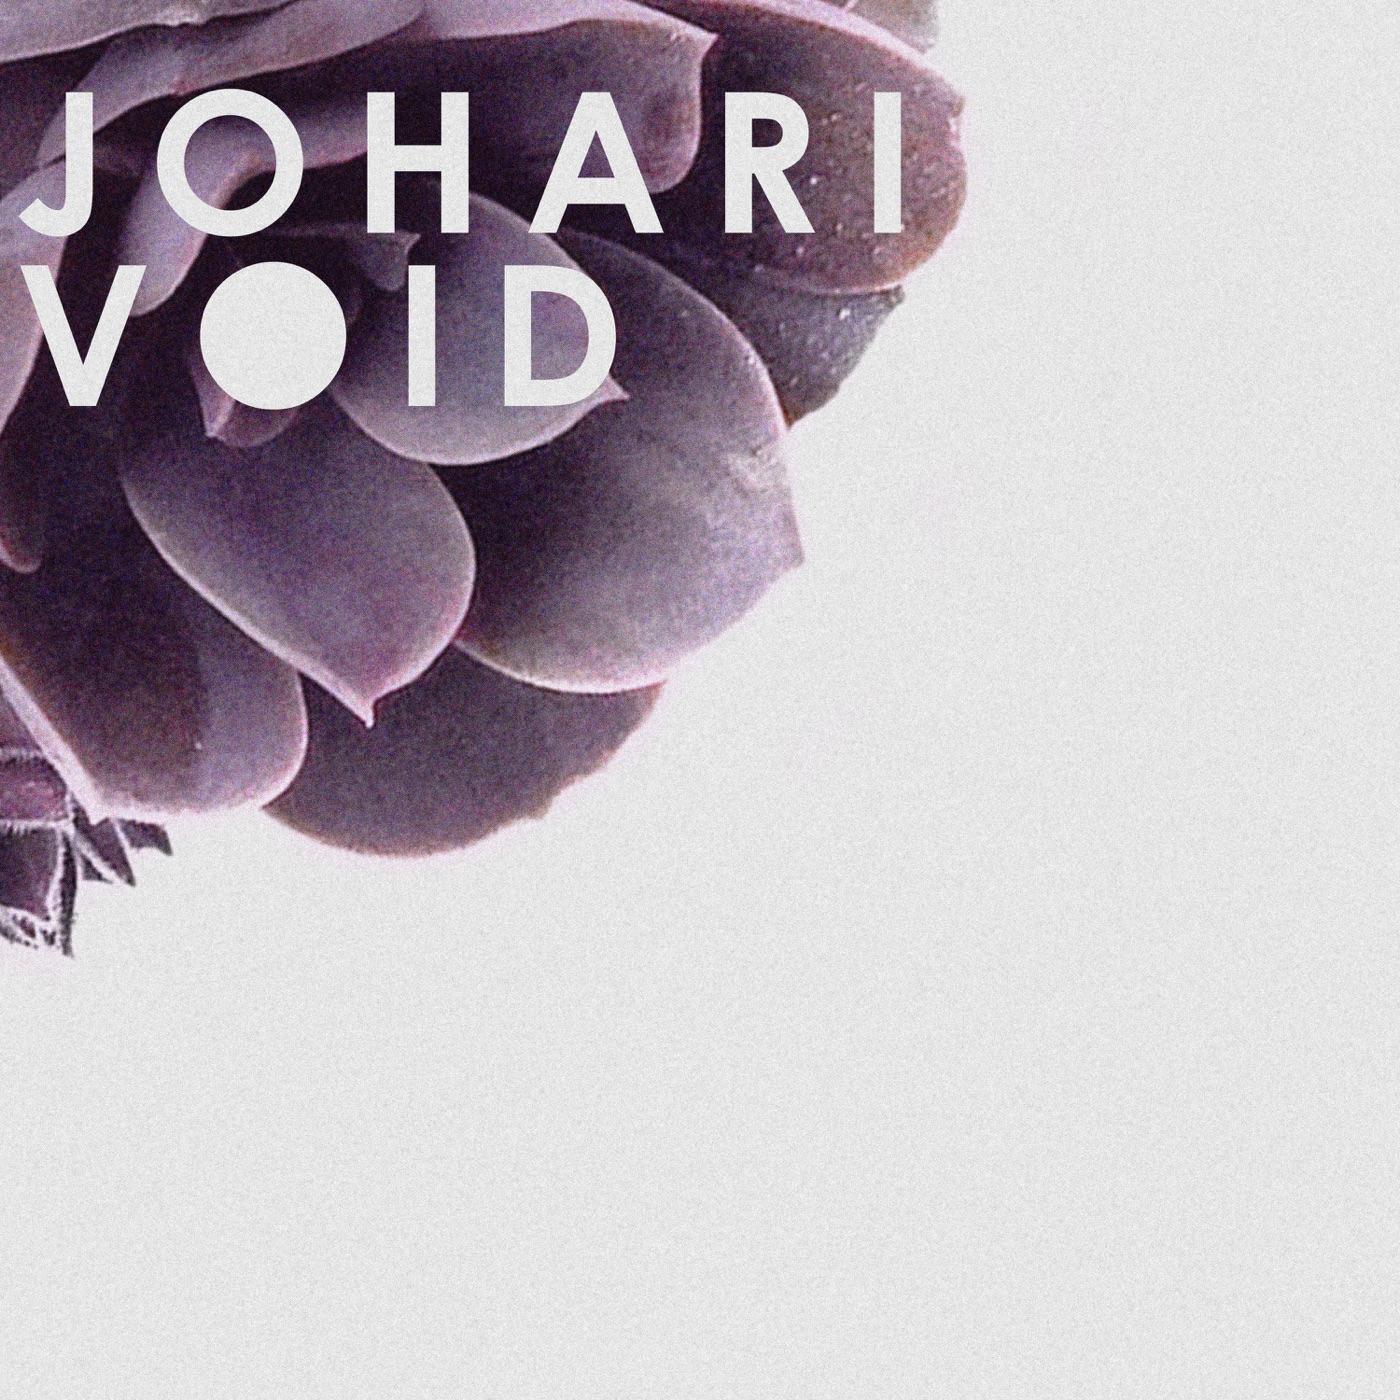 Johari - Void [single] (2017)